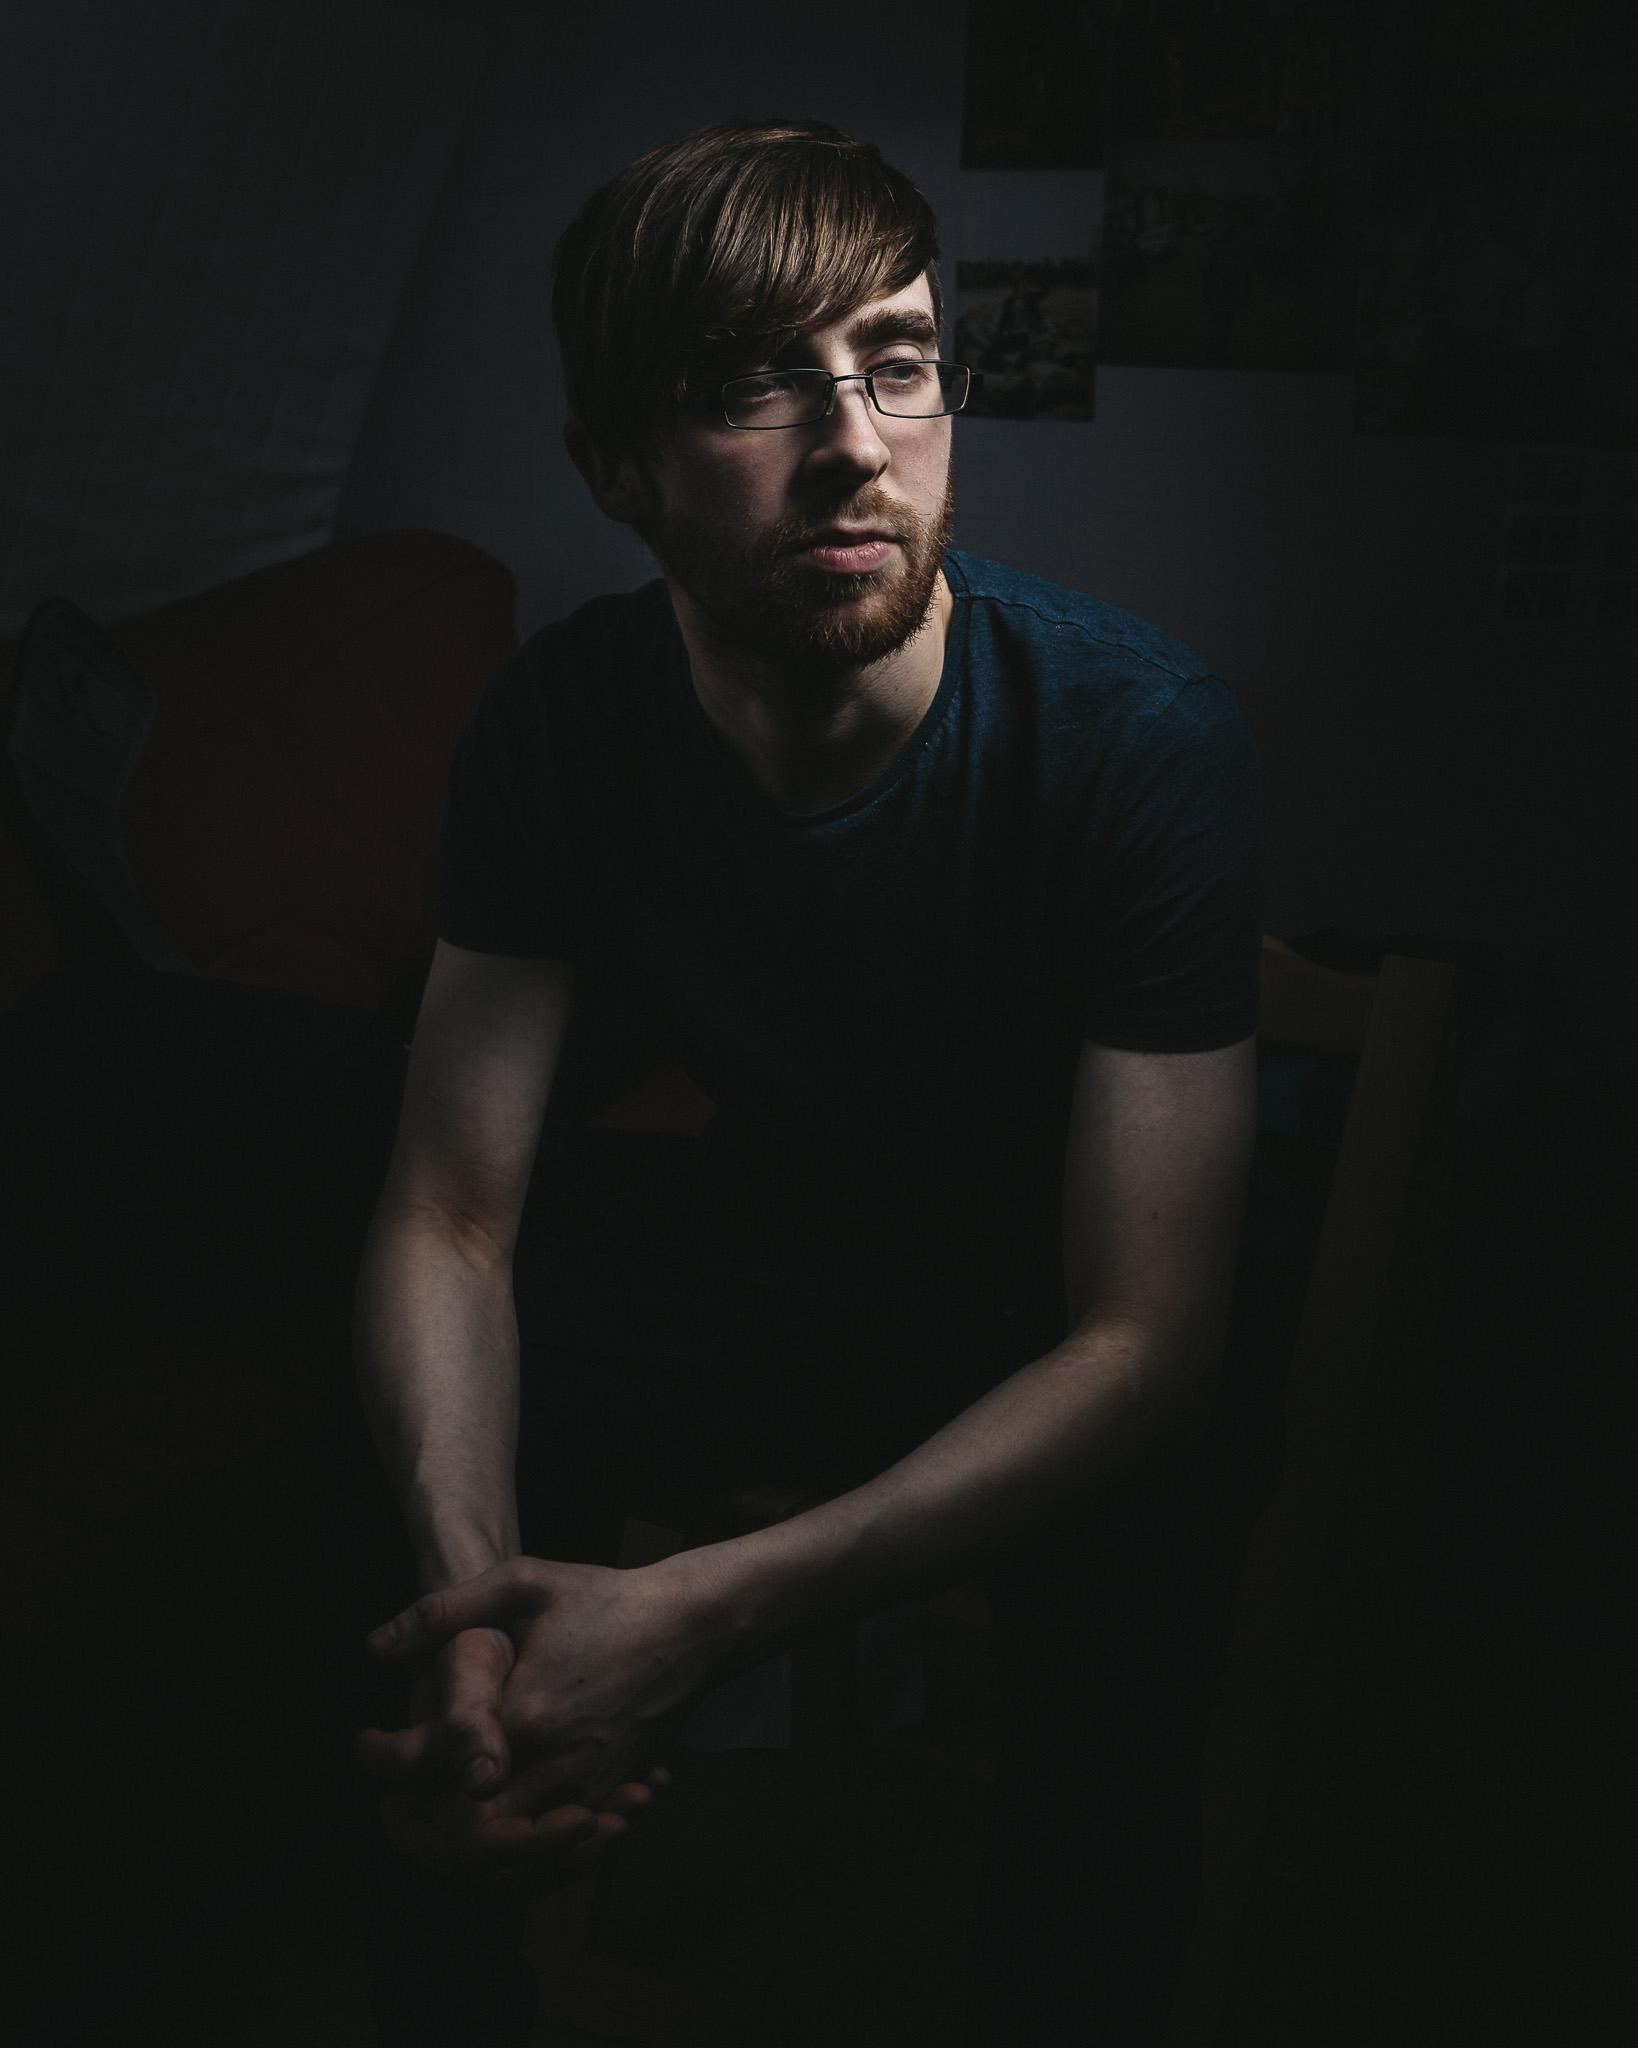 Portrait of London Based Independent Film Maker Robby Wartke a.k.a Autojektor